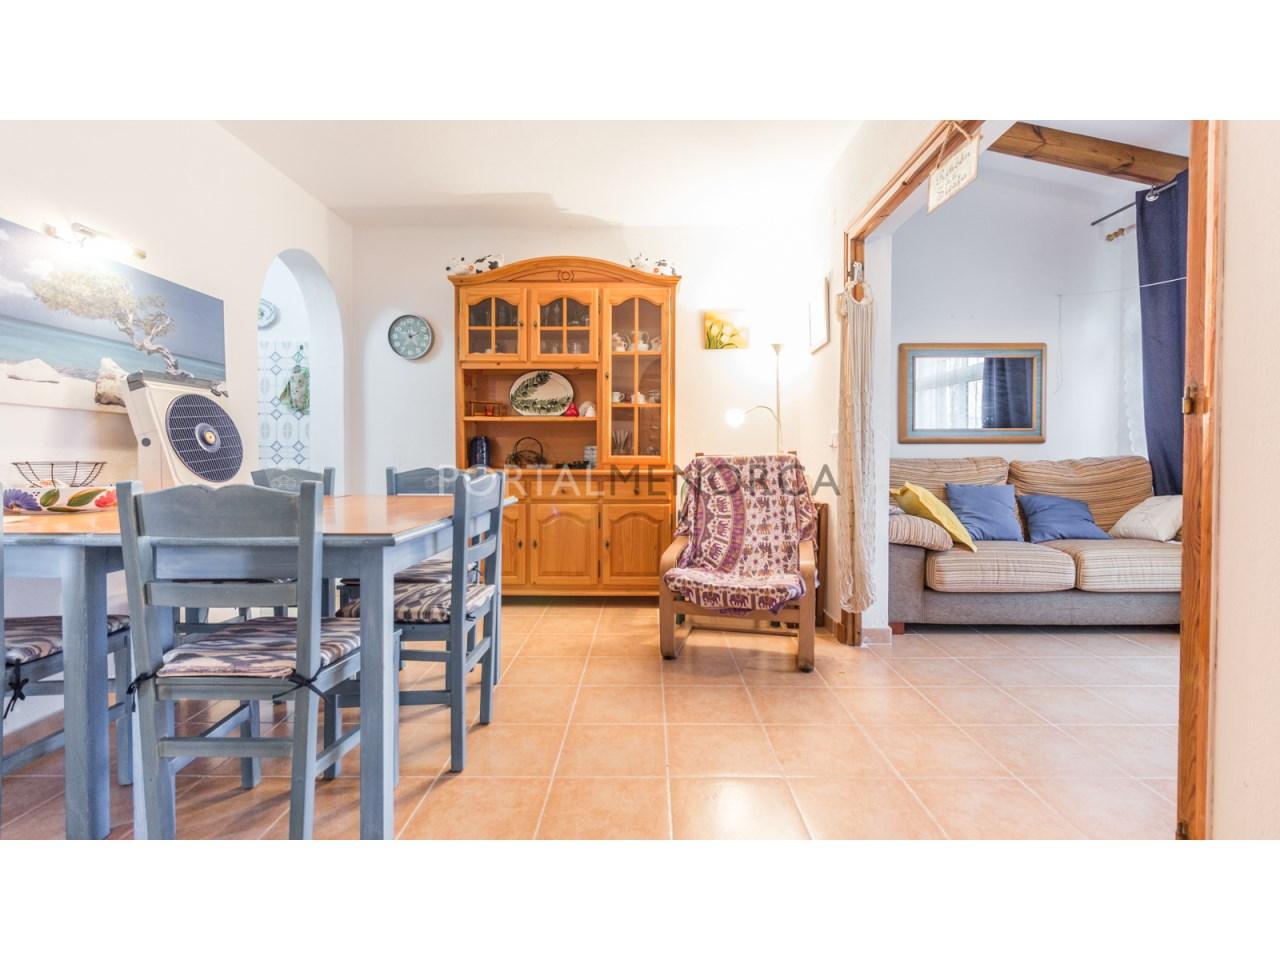 apartament for sale in calan porter menorca (2 de 7)